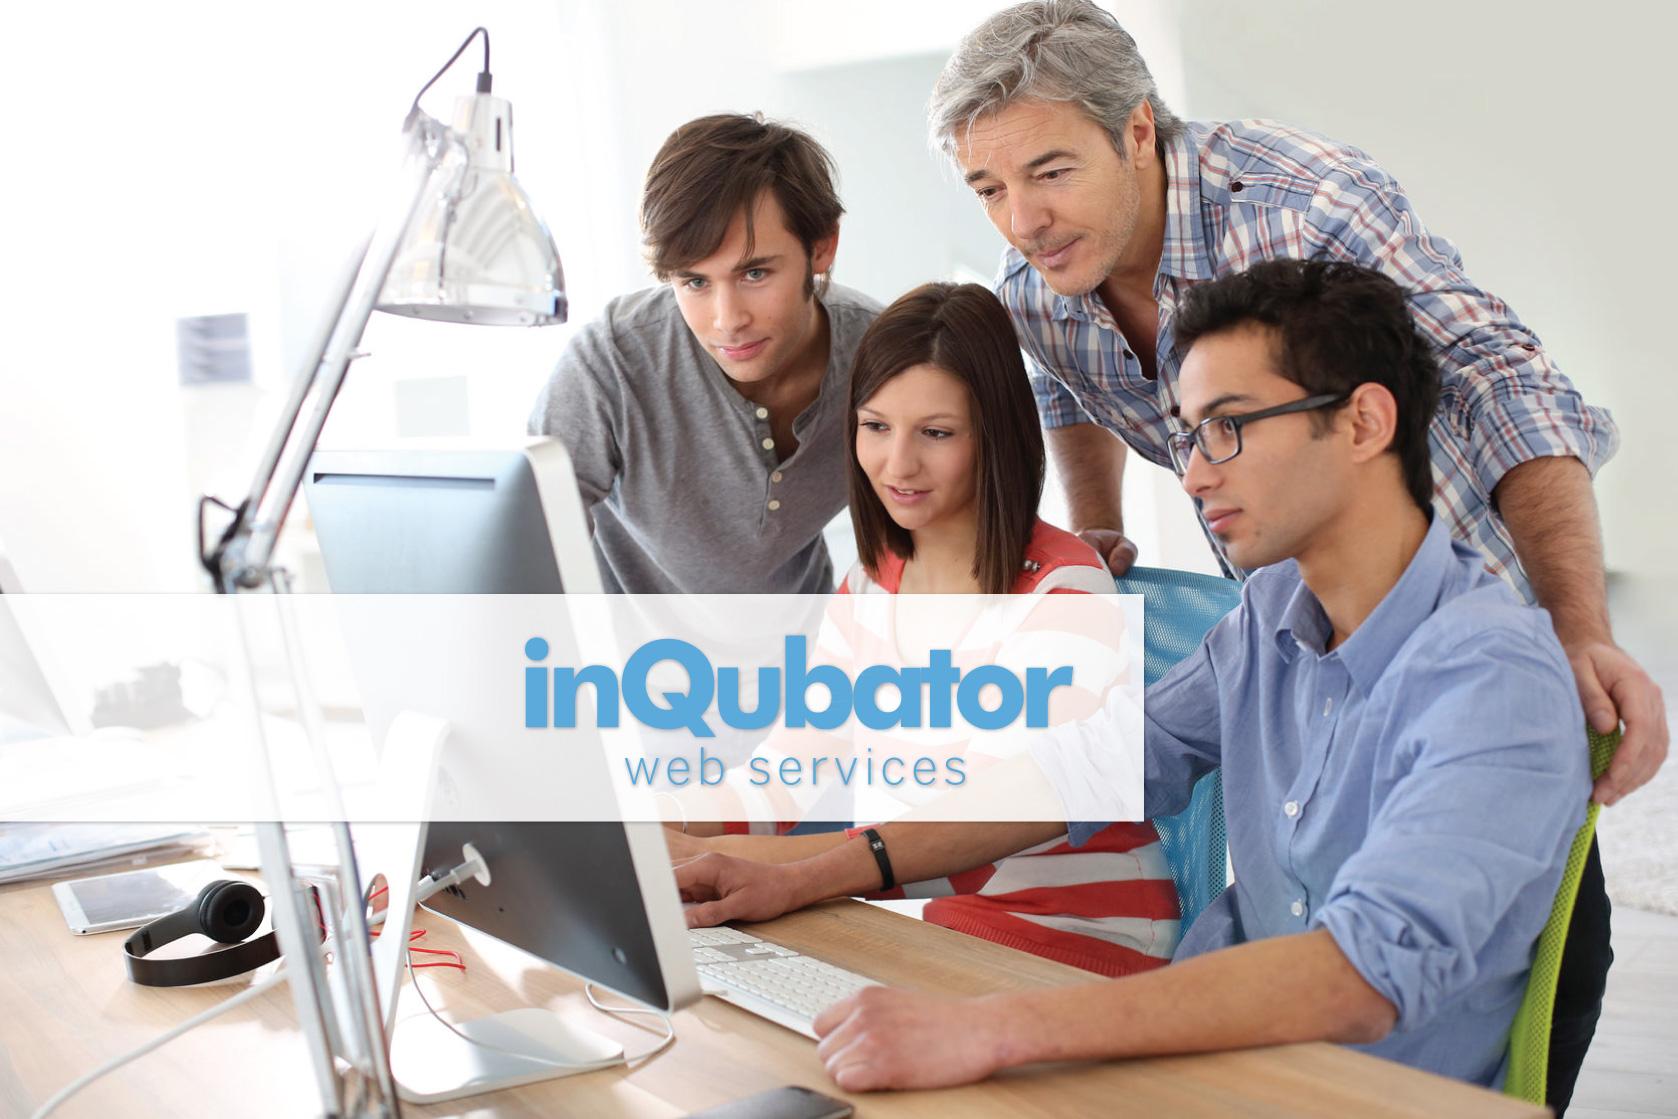 inqubator-web-services